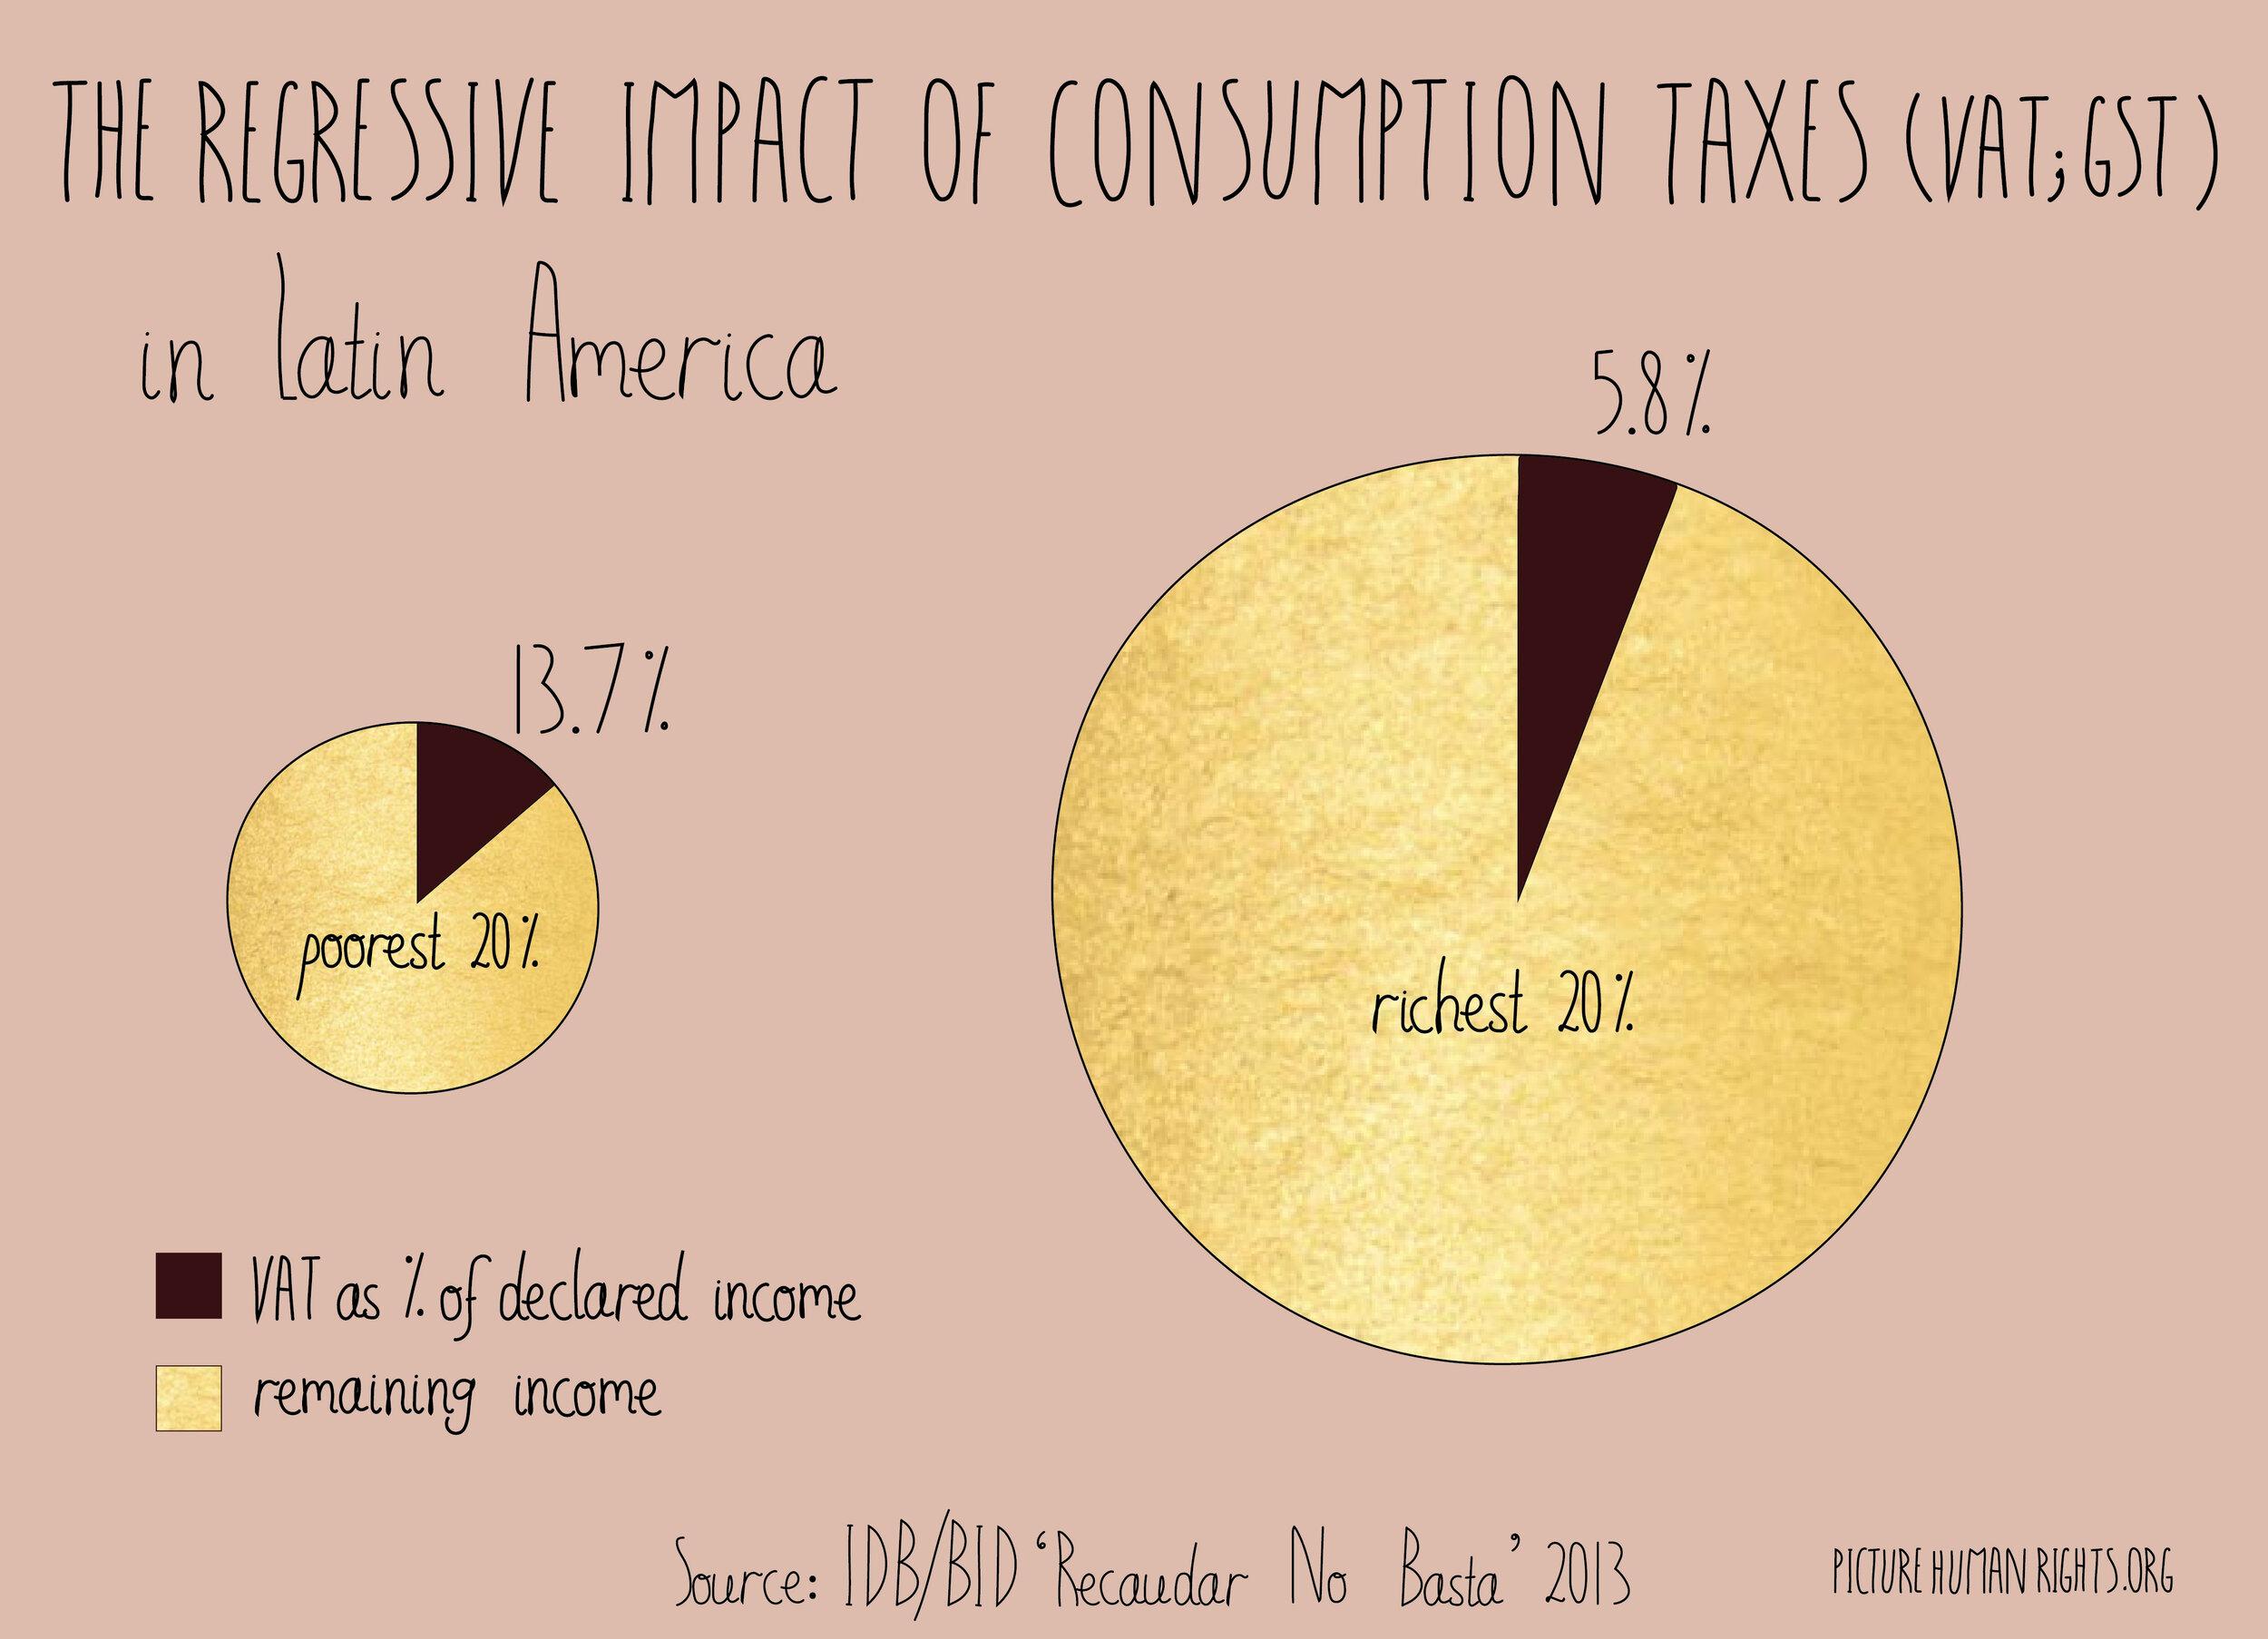 The regressive impact of consumption taxes